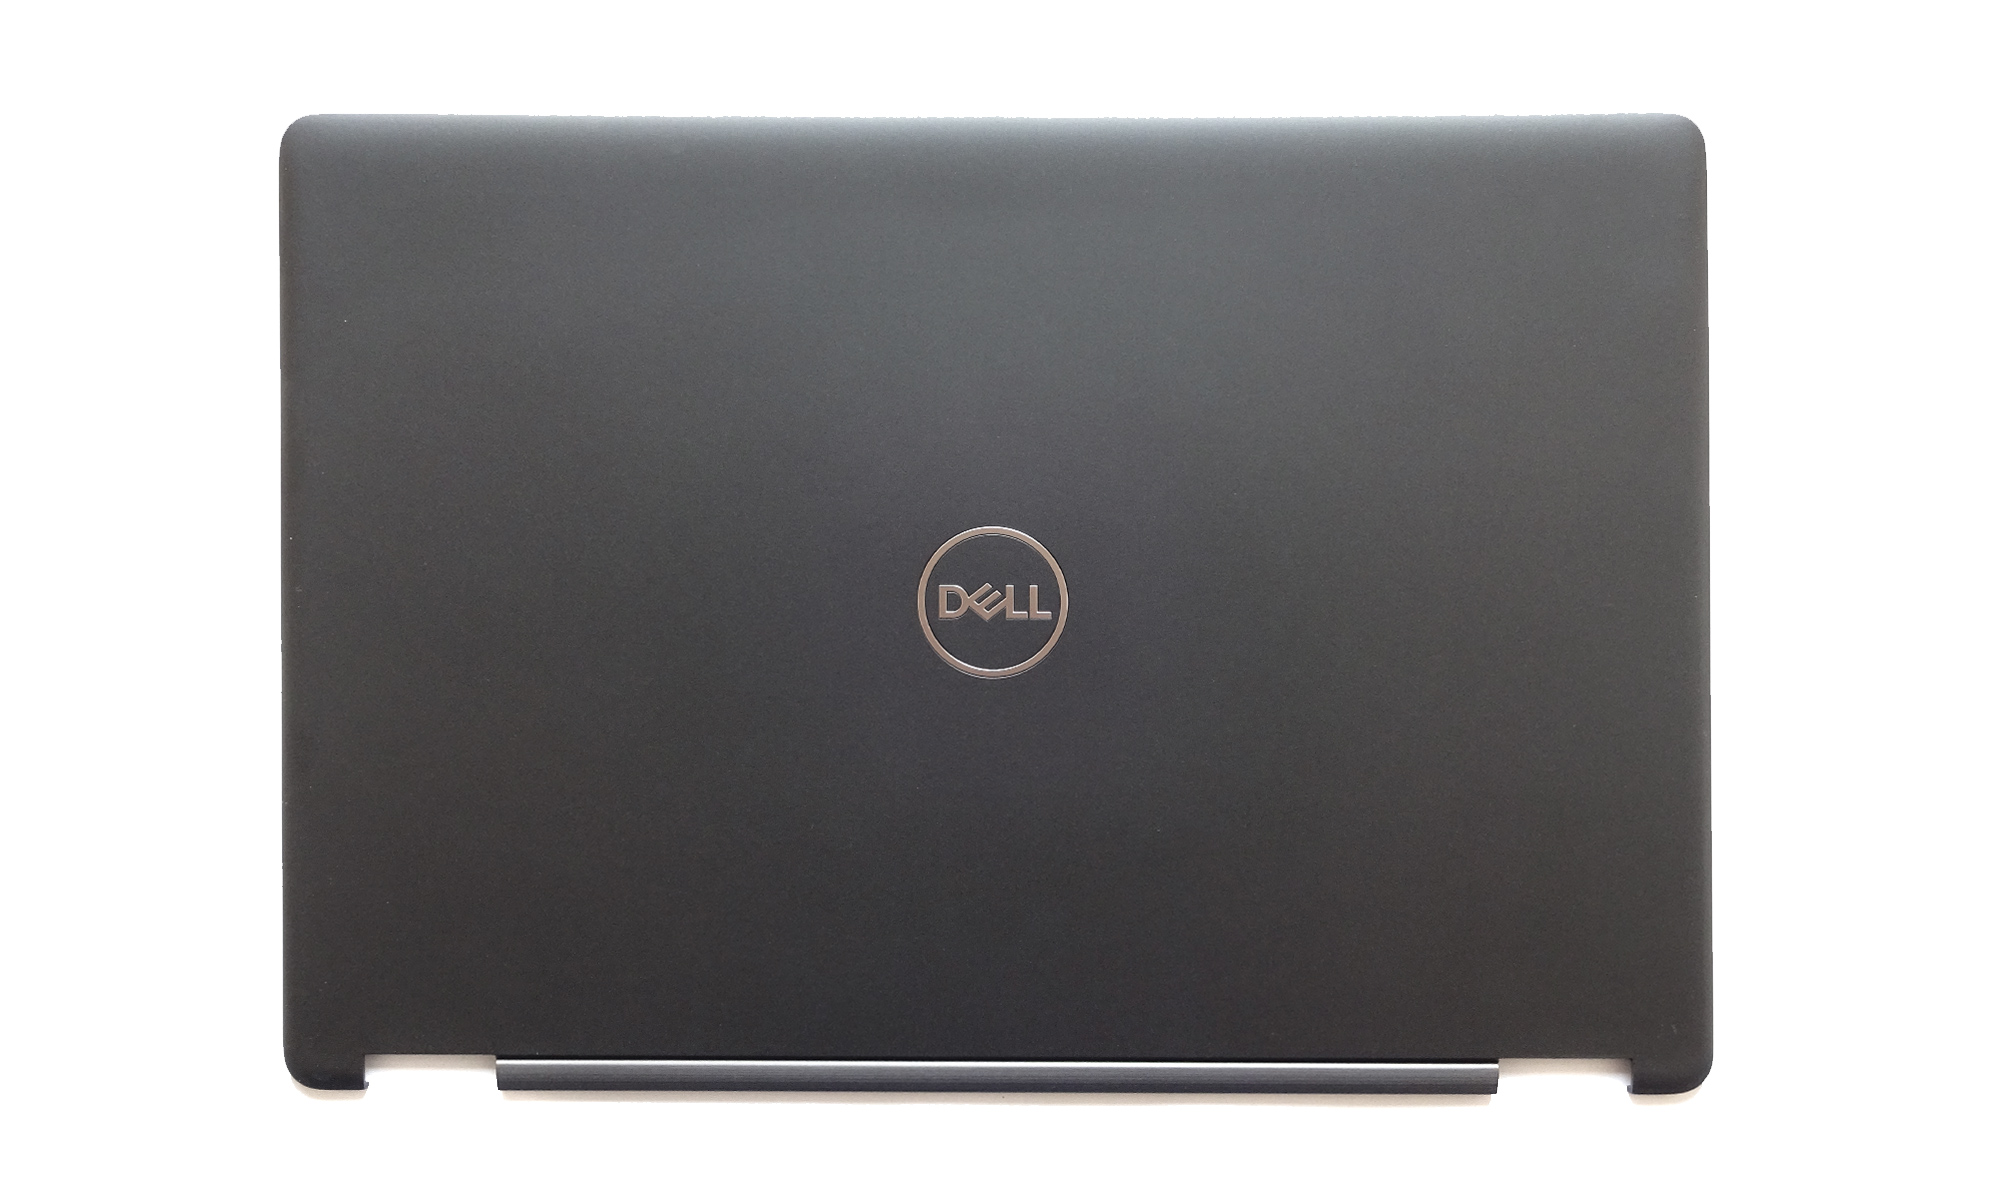 Capac display pentru Dell Latitude 5480, 5490 original, negru, model WMY72